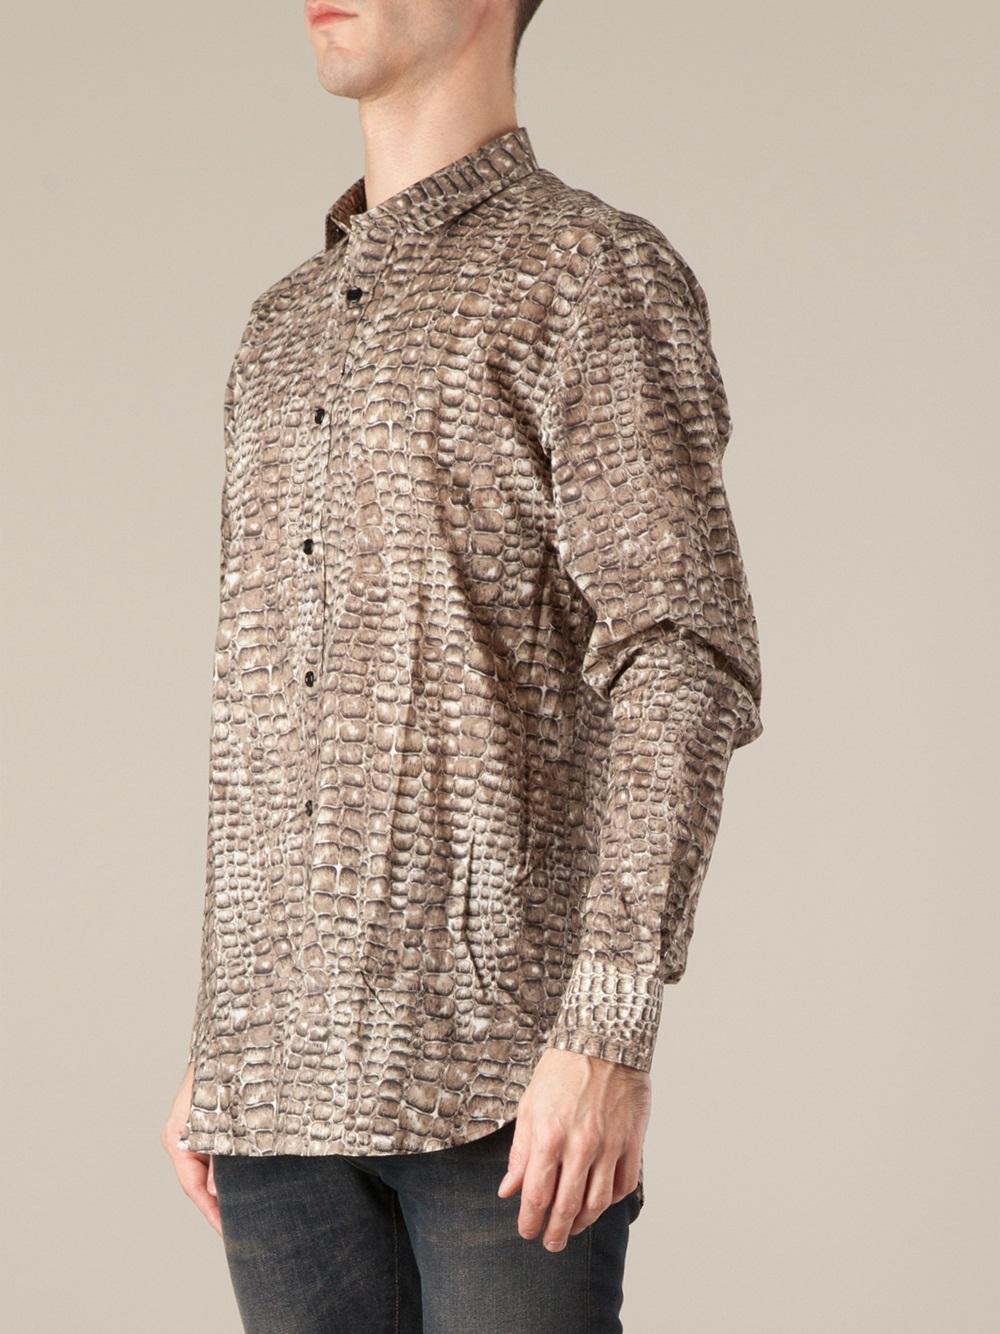 f14b77bd567 Saint Laurent Alligator Skin Print Shirt in Brown for Men - Lyst